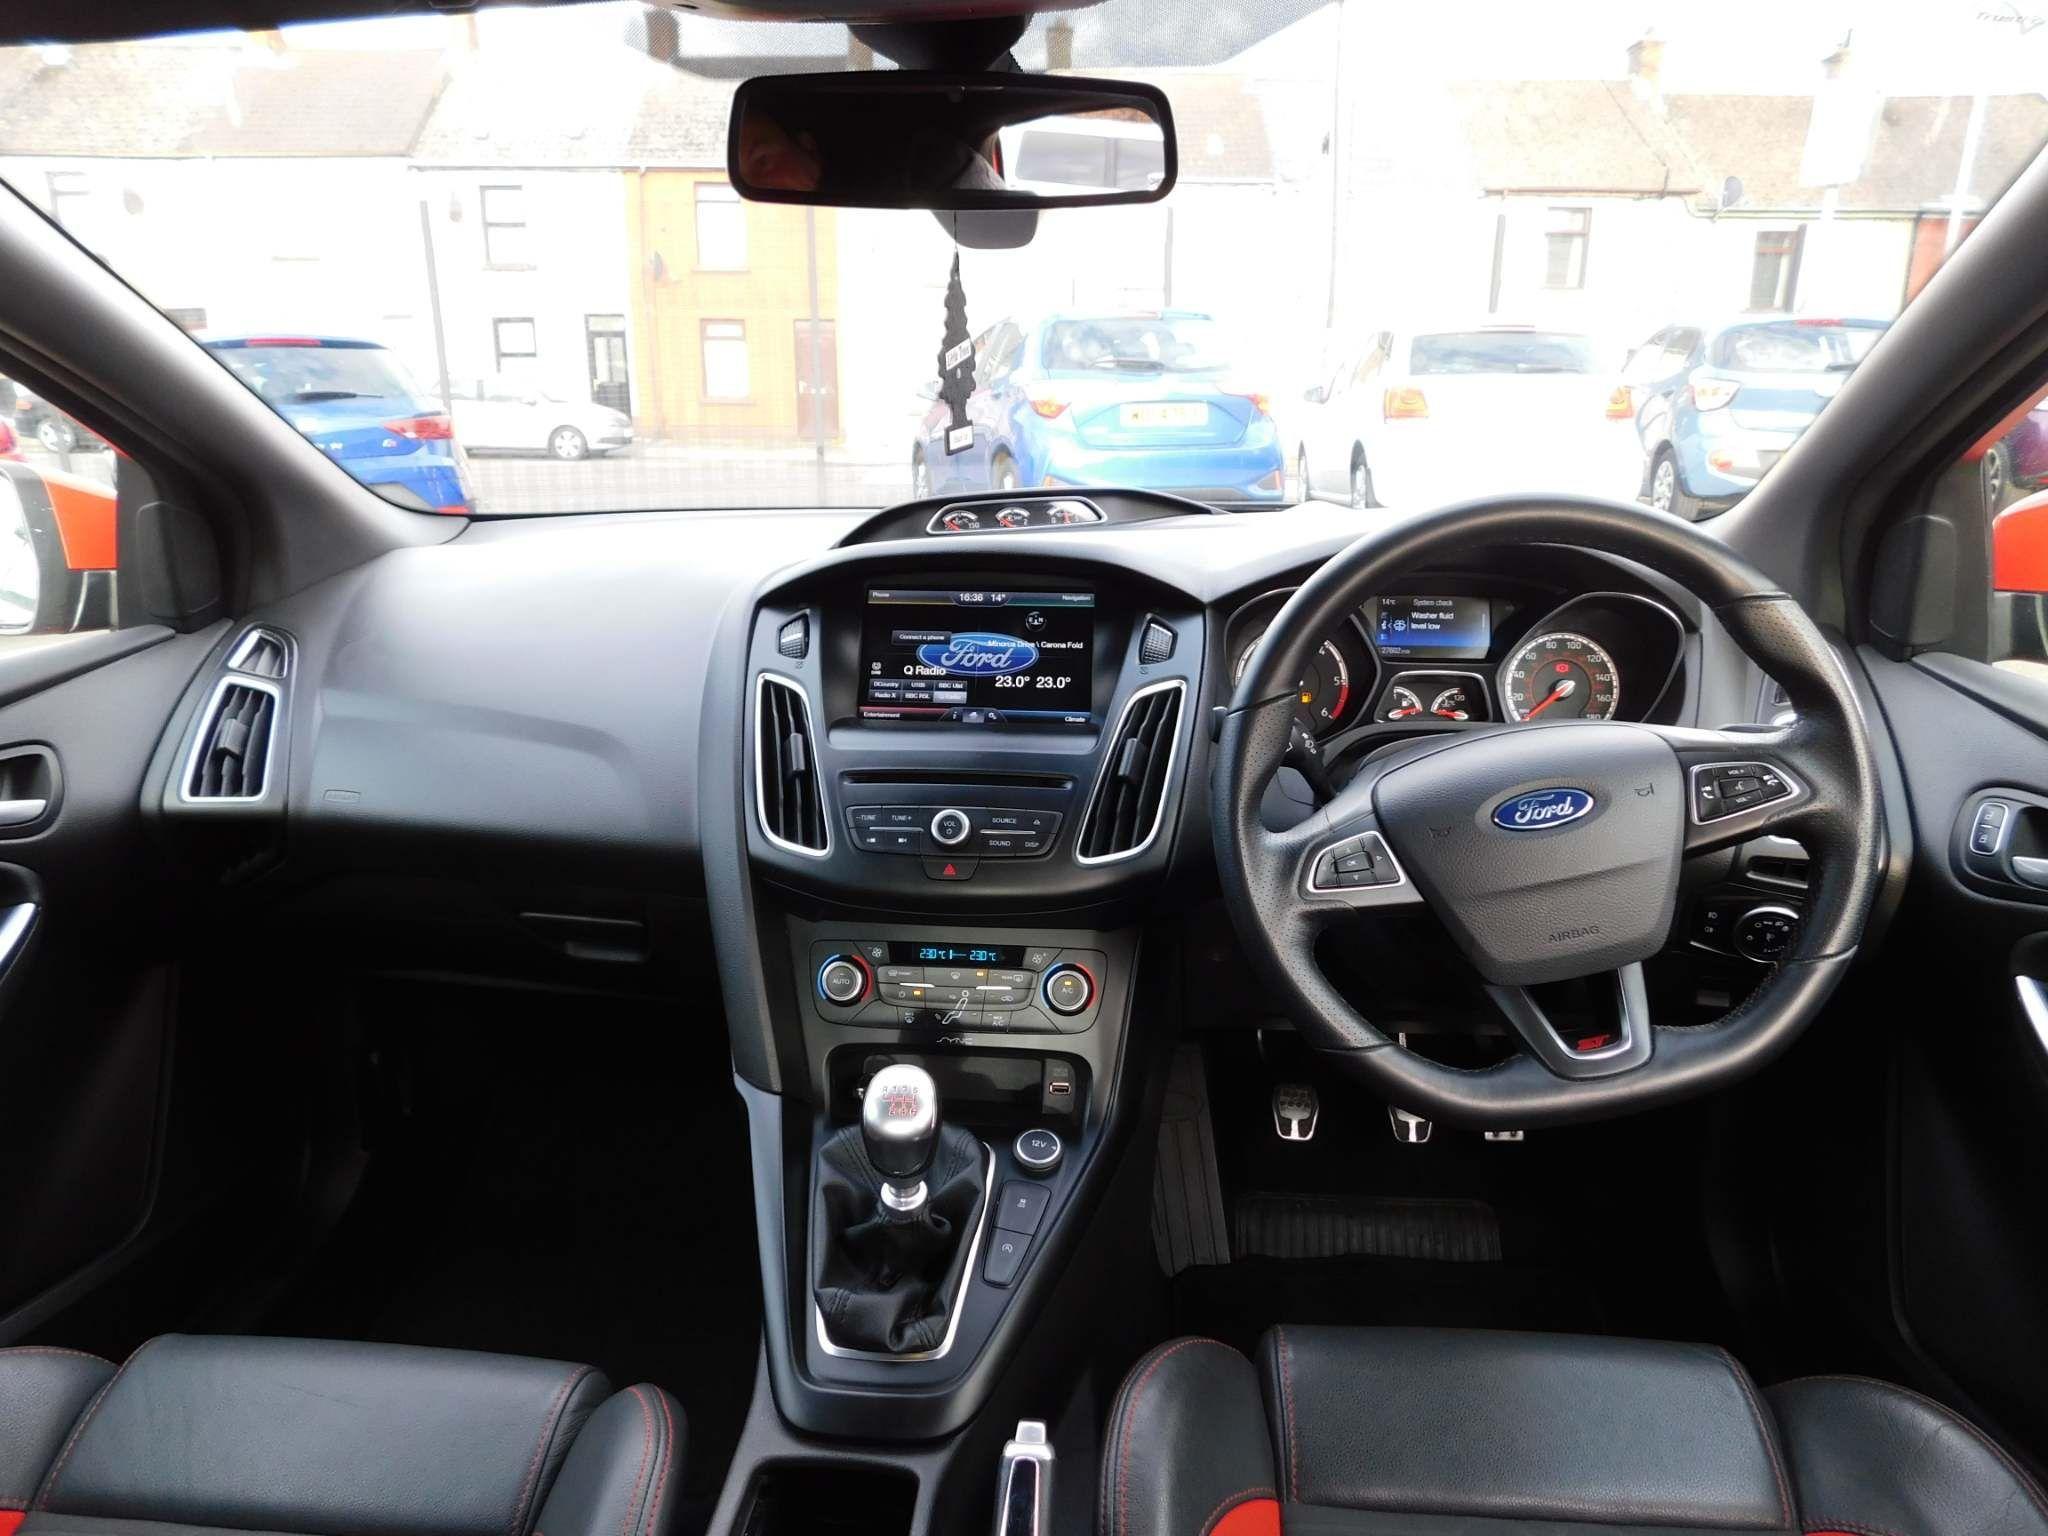 2015 FORD Focus 2.0 TDCi ST-2 (s/s) Diesel Manual just arrived – Meadow Cars Carrickfergus full